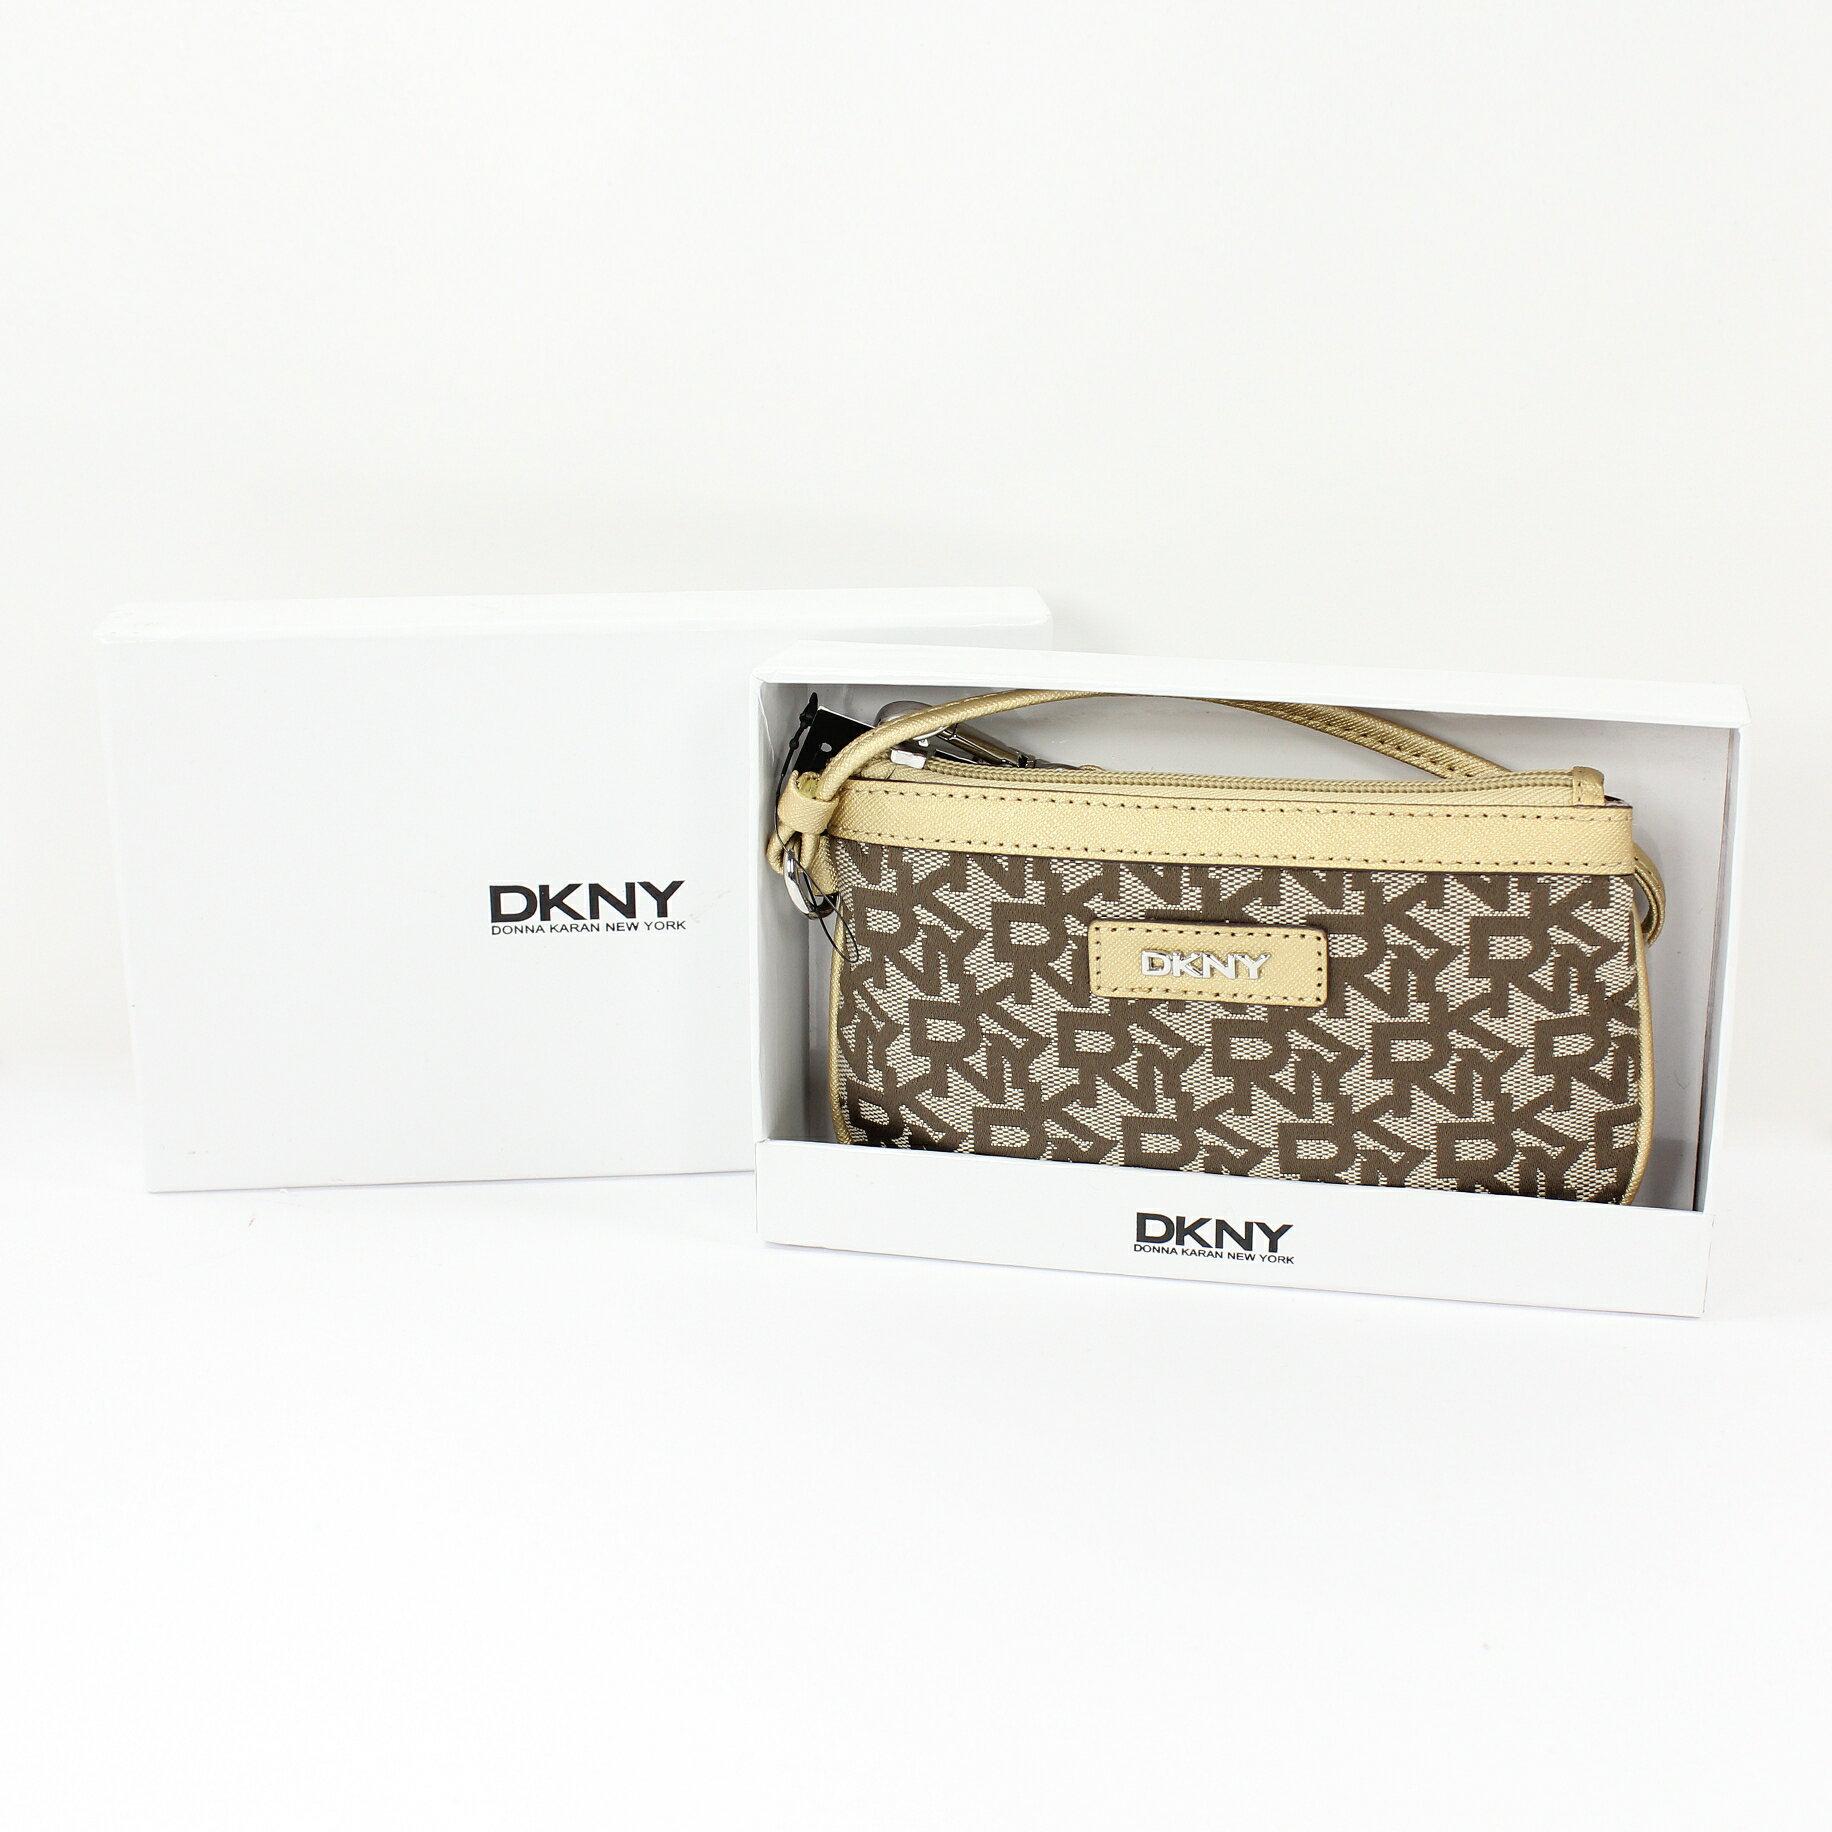 <br/><br/>  美國百分百【全新真品】DKNY 手拿包 金色 手機包 錢包 皮包 提花布 禮盒 皮革 經典 Logo 女包 A693<br/><br/>